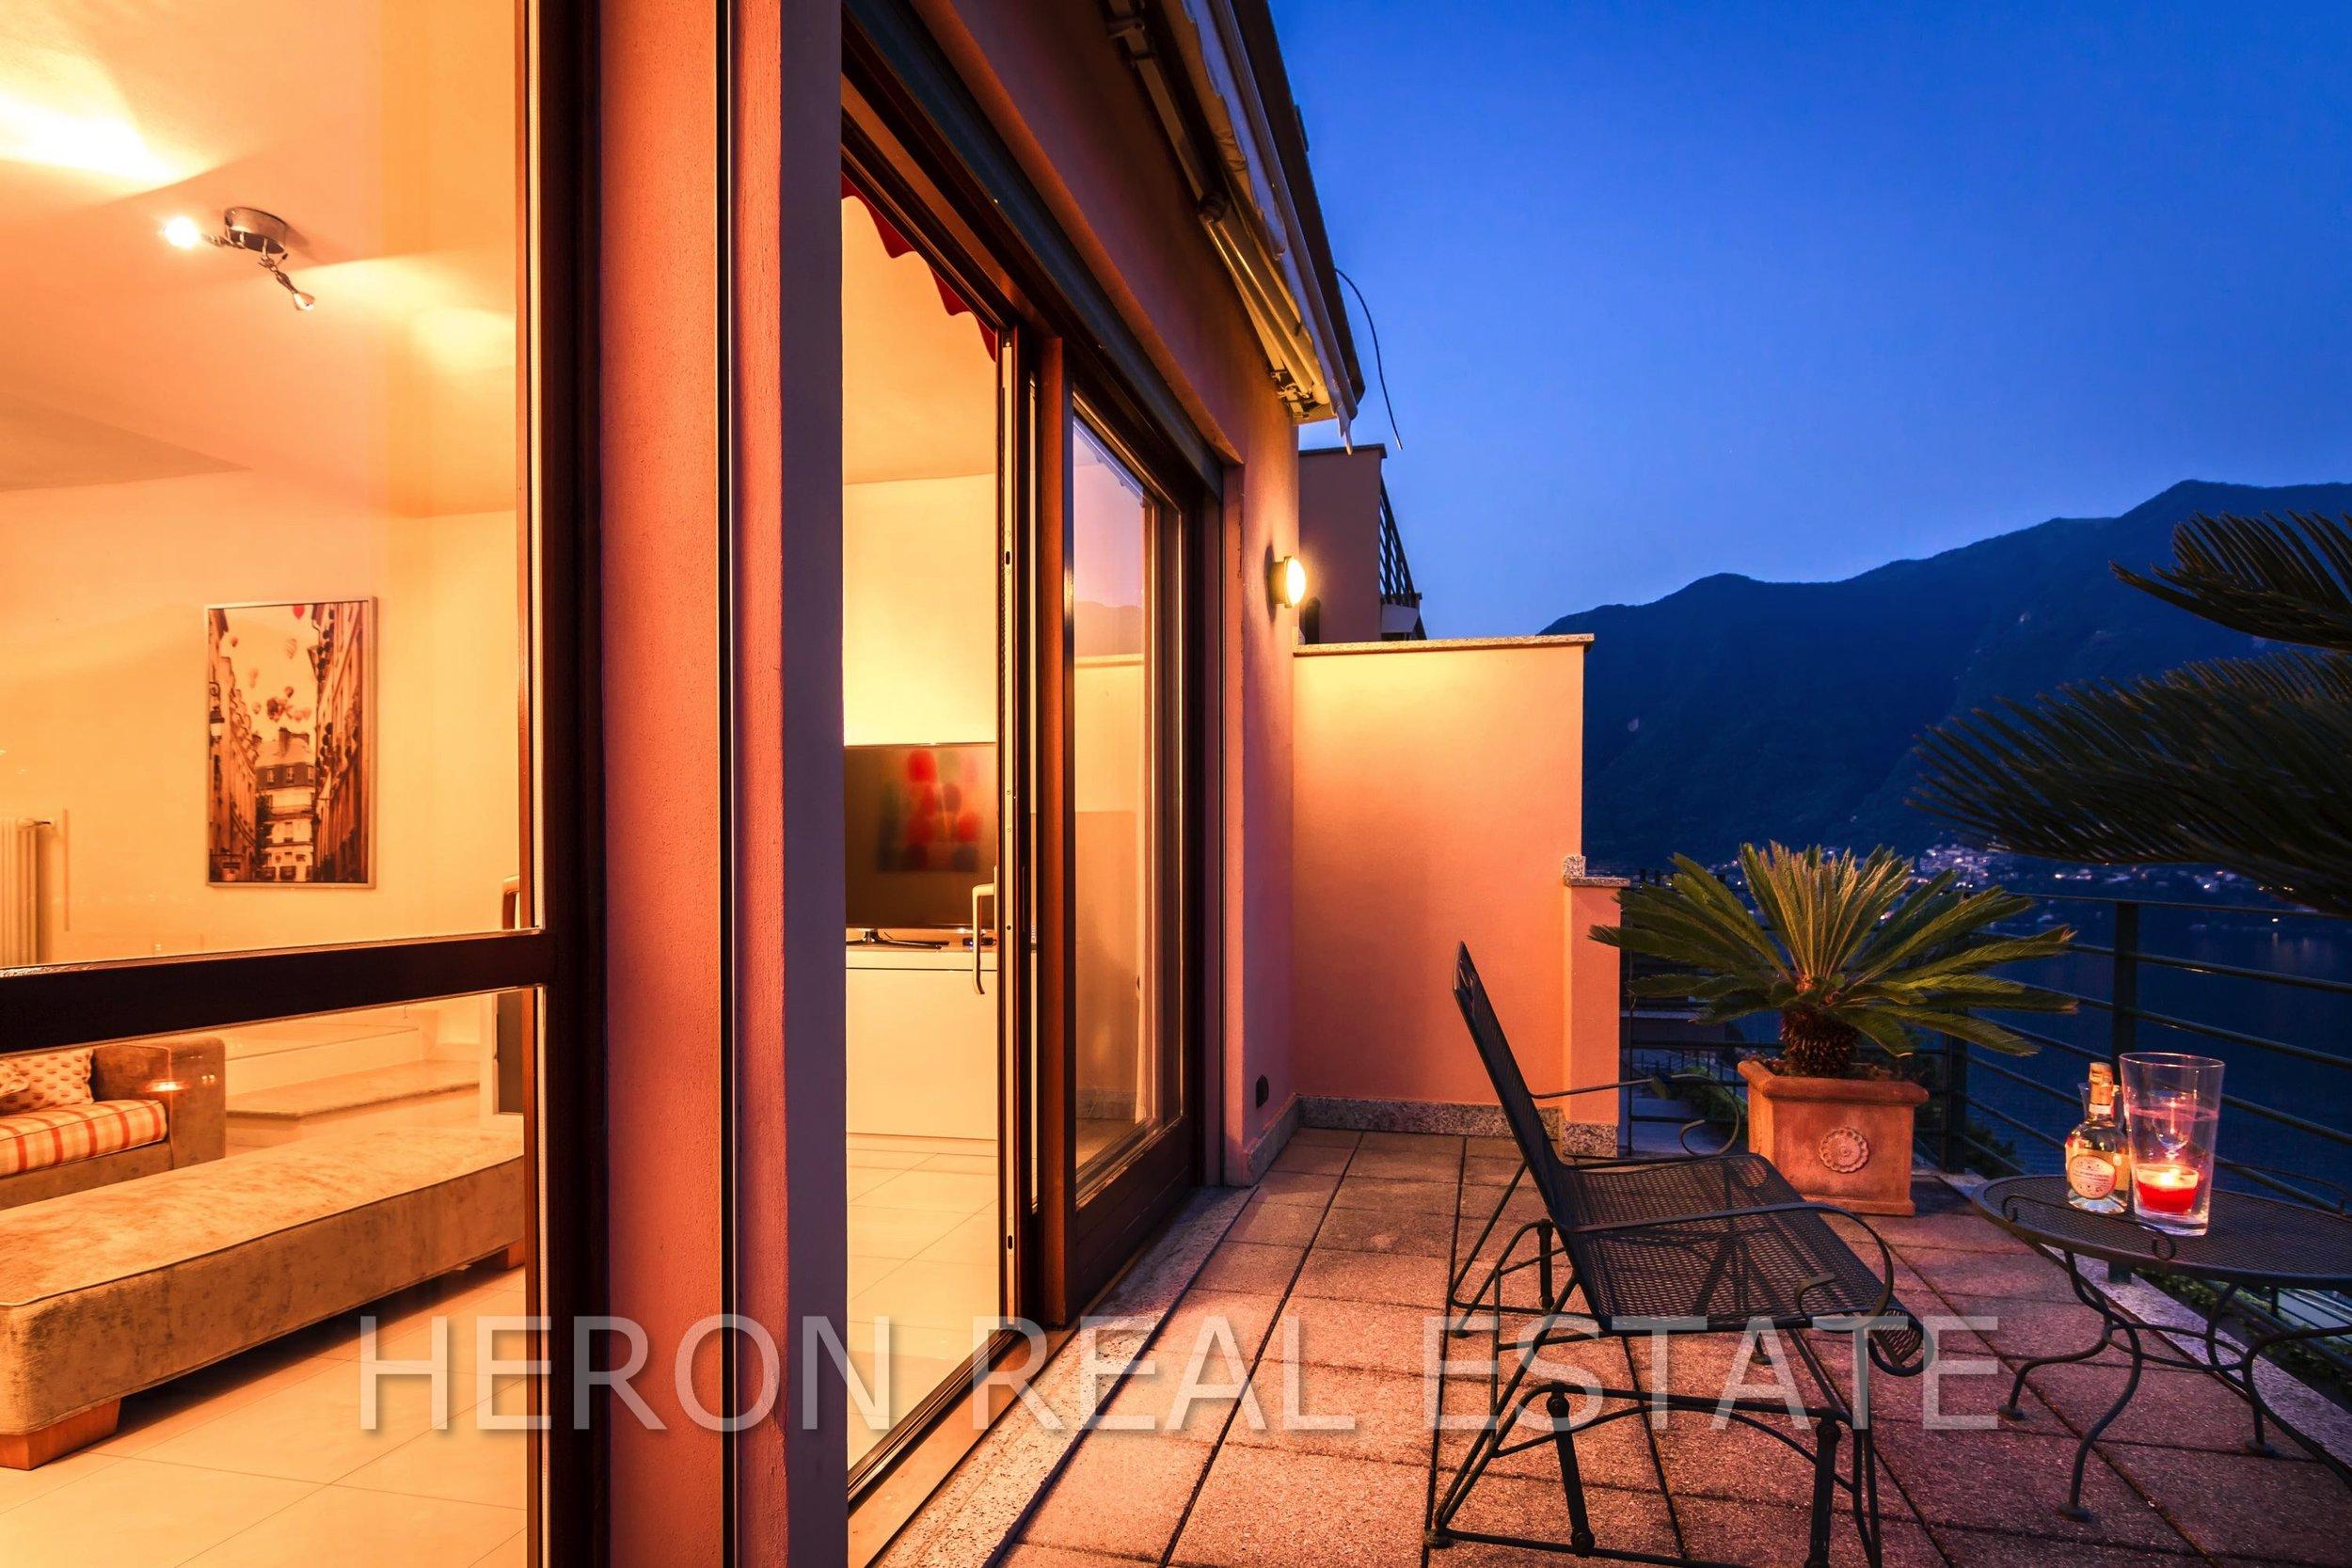 14 Carate Urio terrace by night.jpg